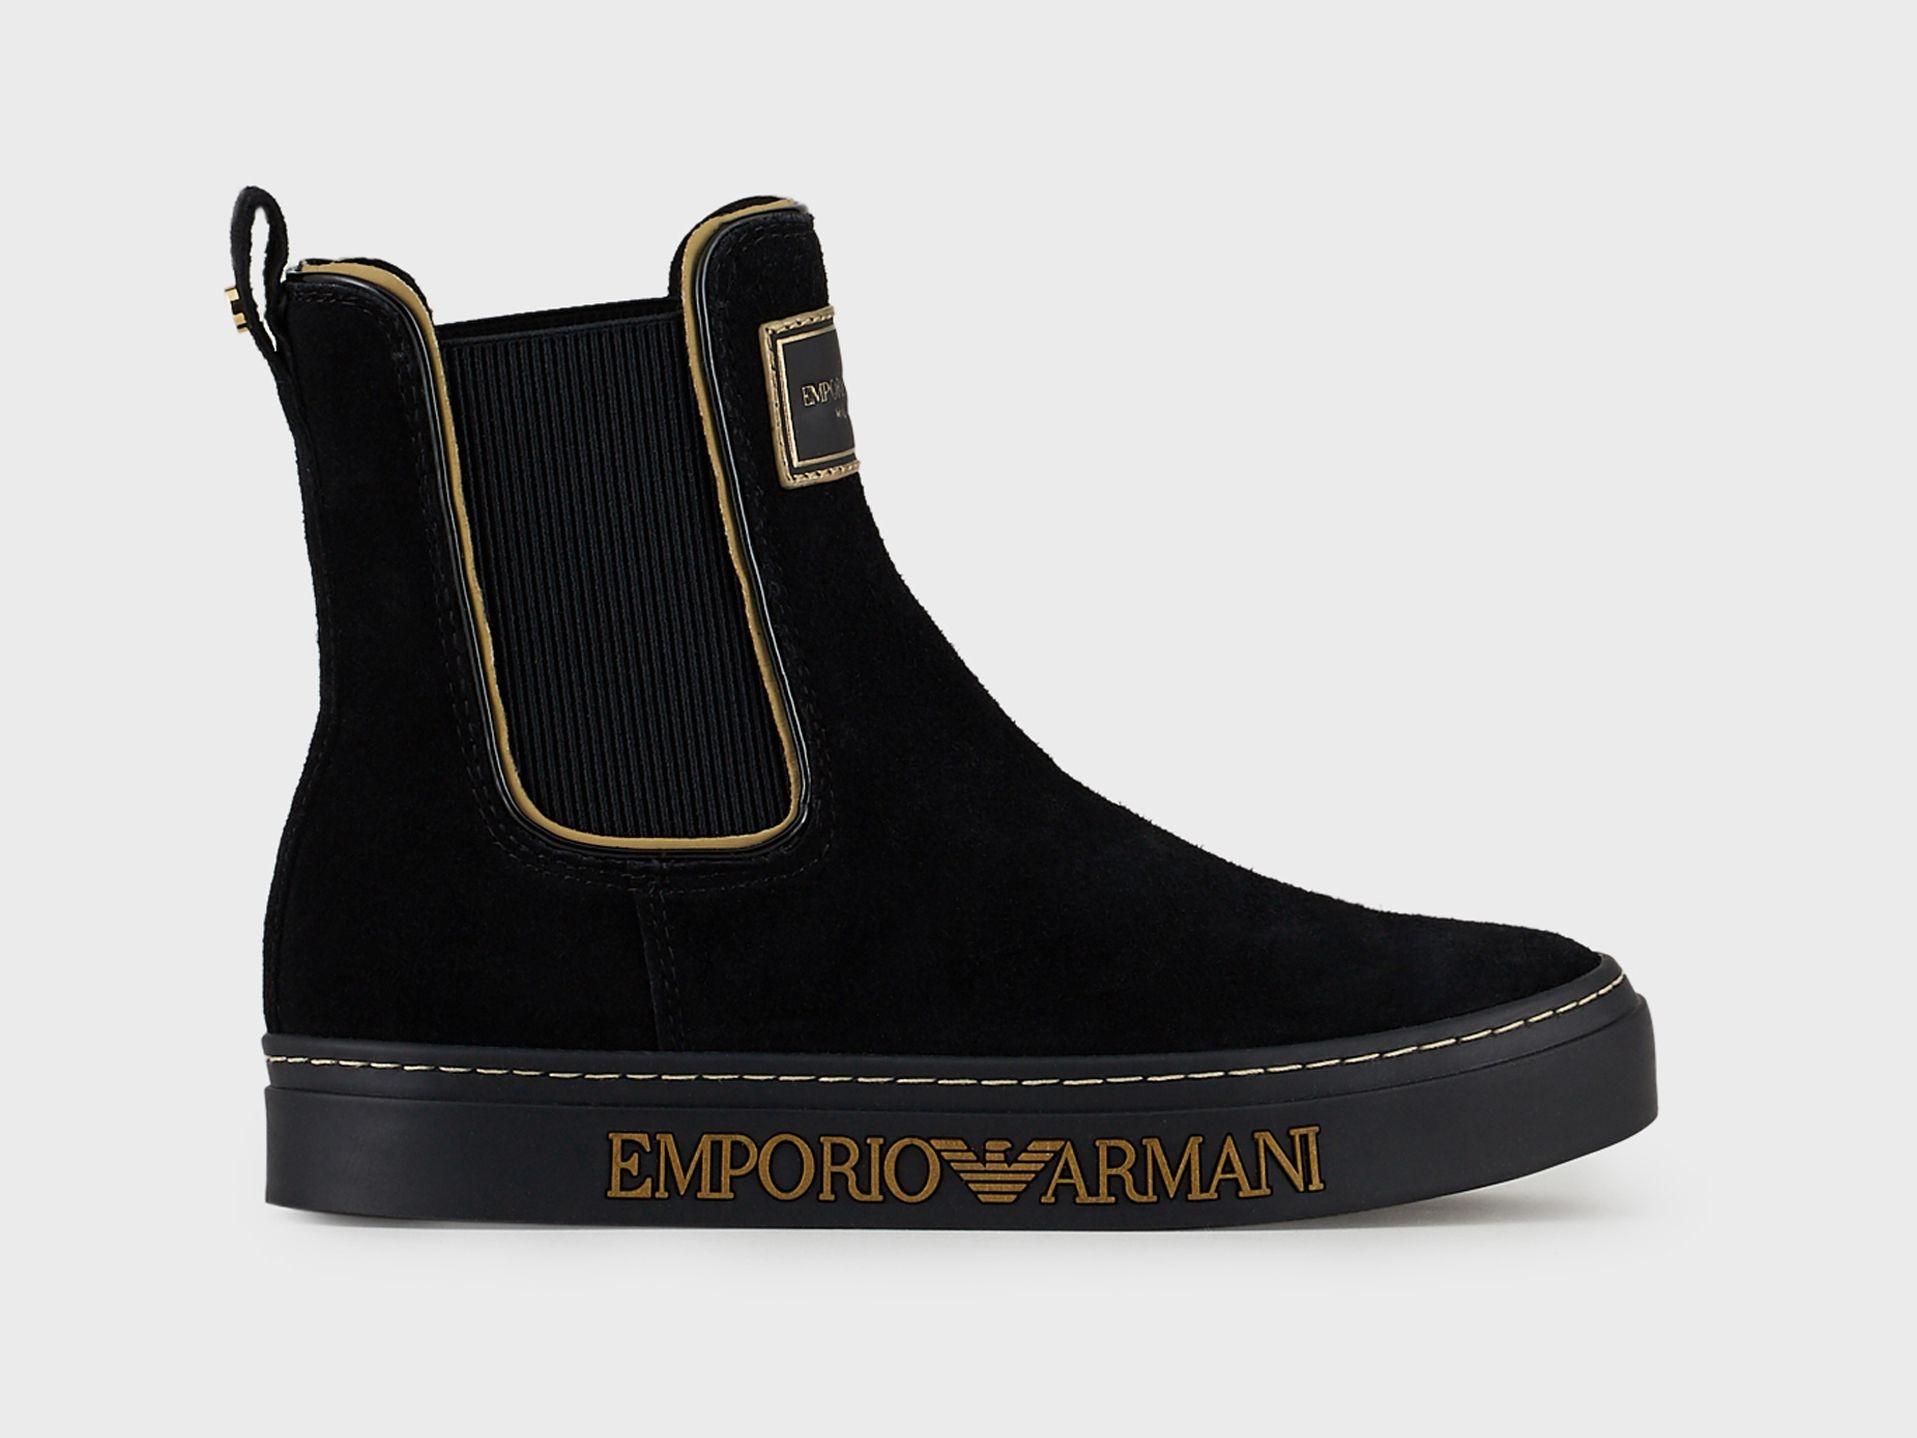 EMPORIO ARMANI X3Z045 XM537 K001 NERO BLACK